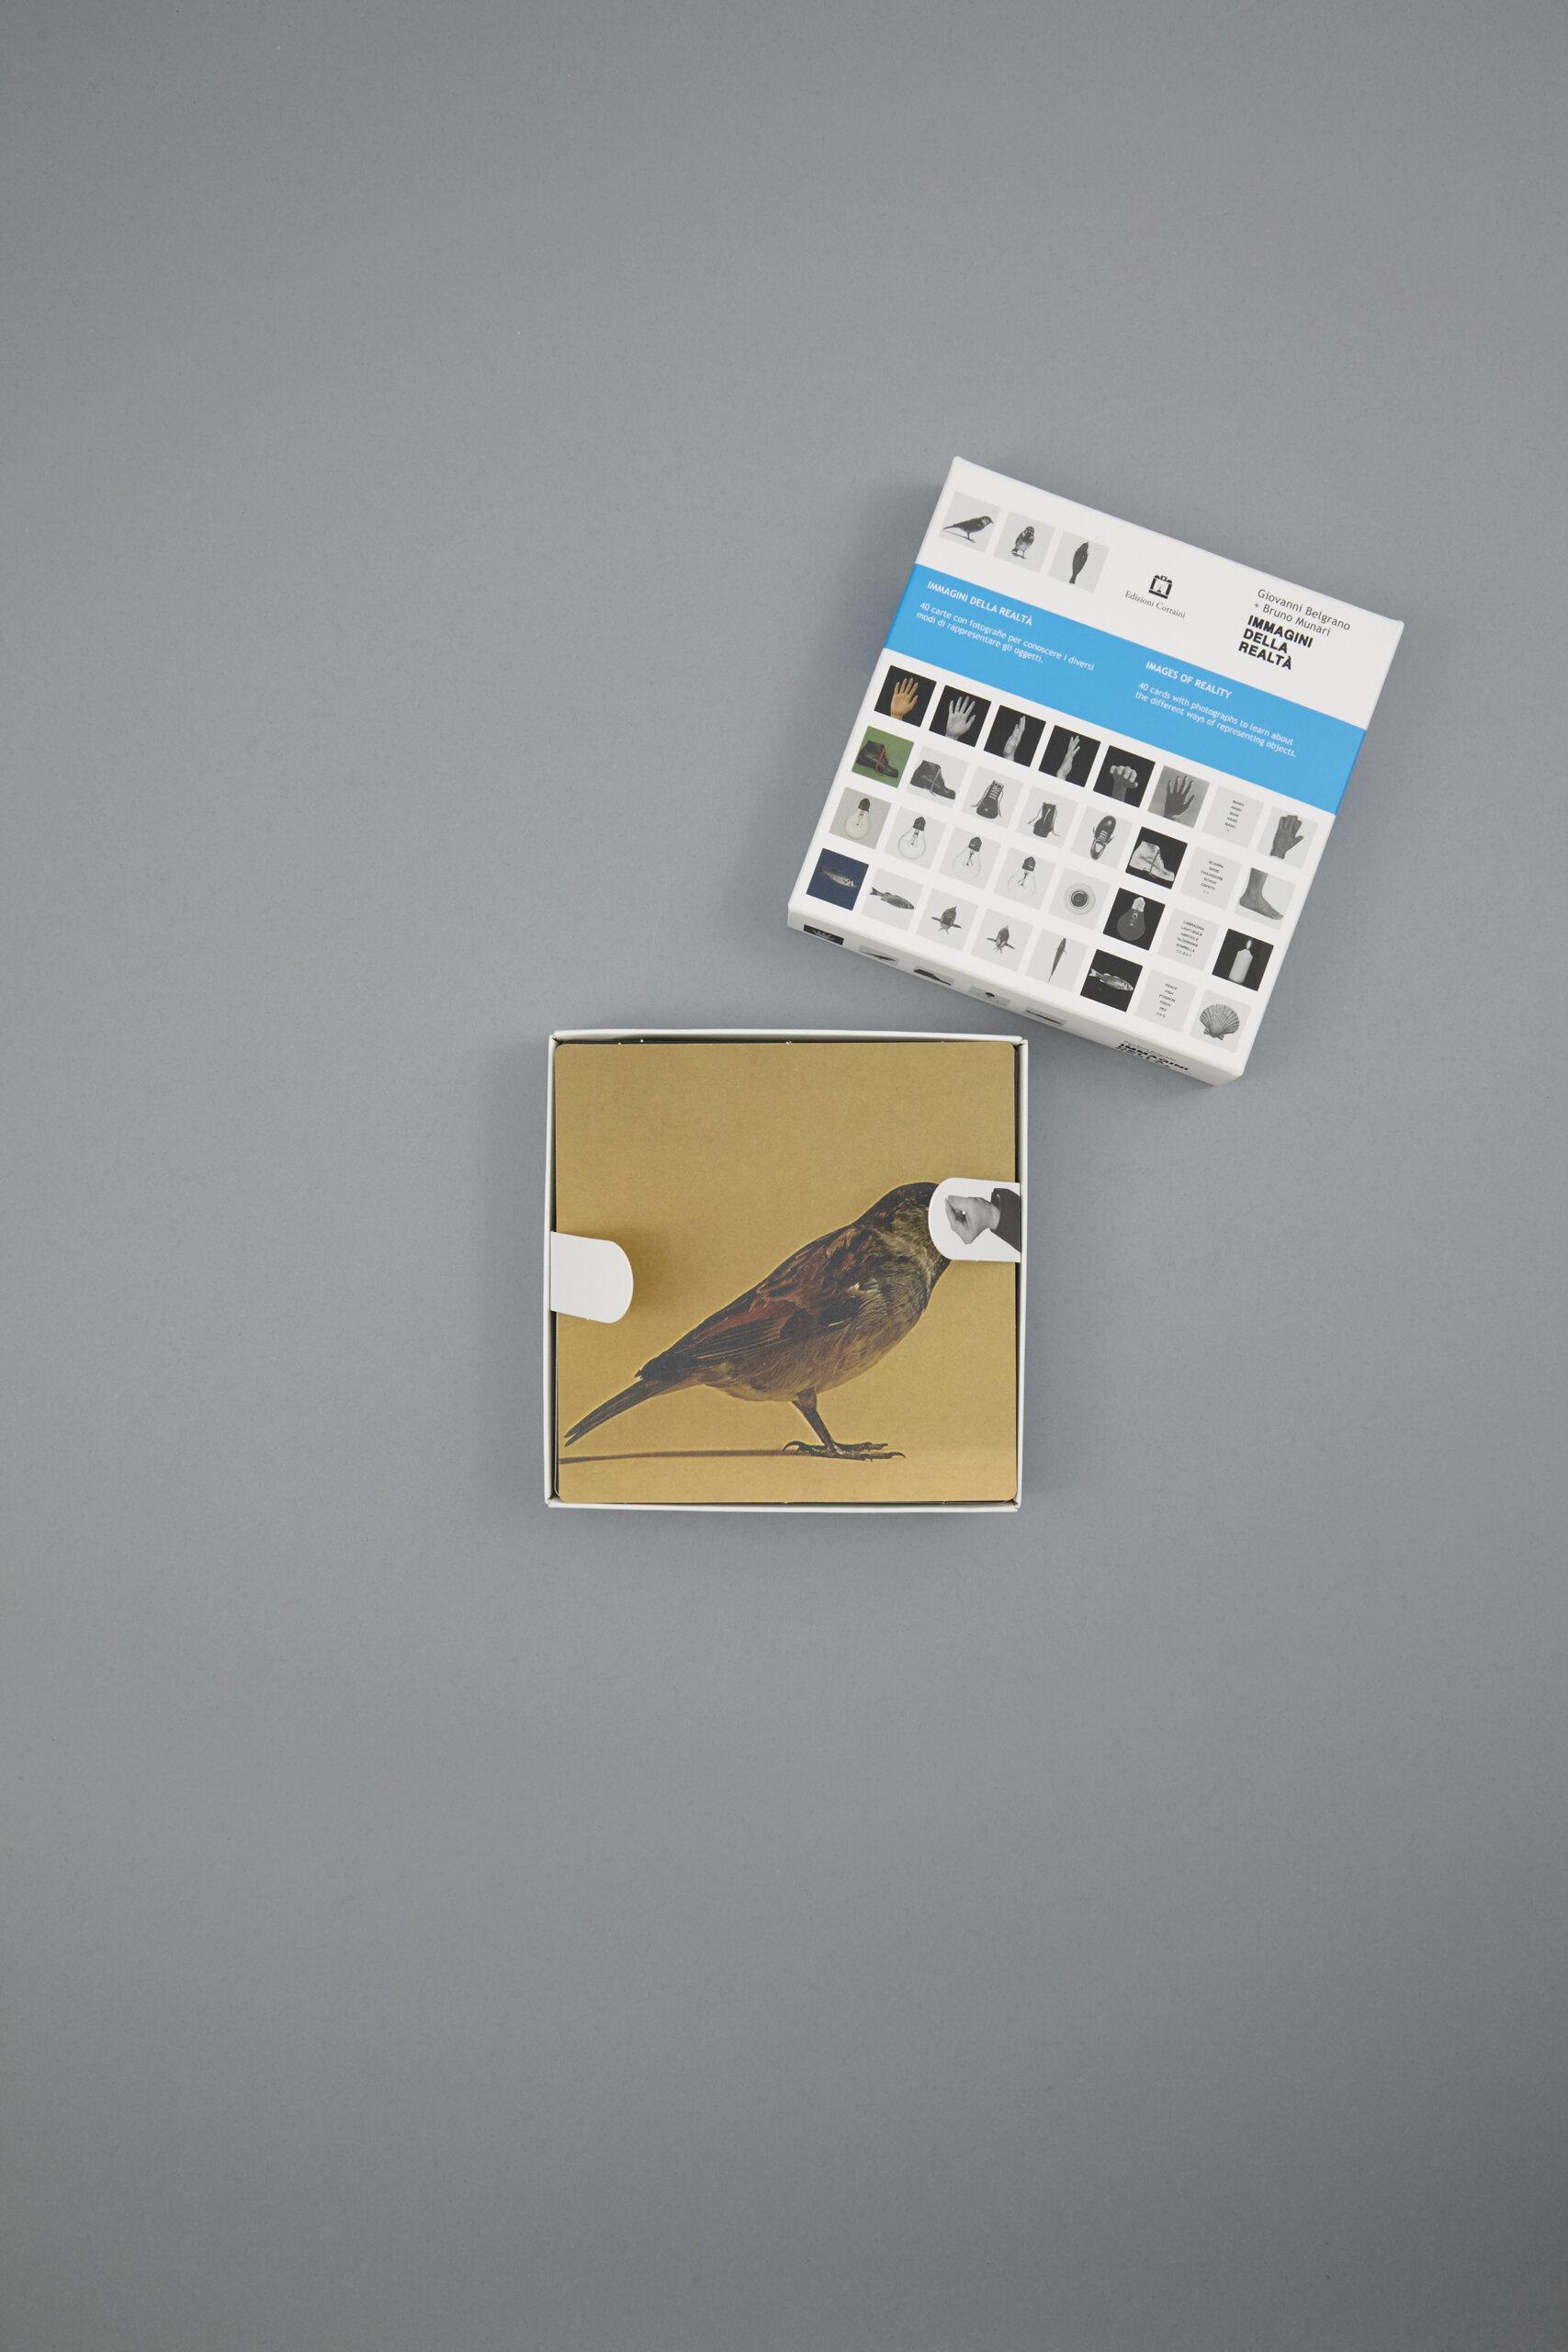 munari-images-reality-delpire-co-2